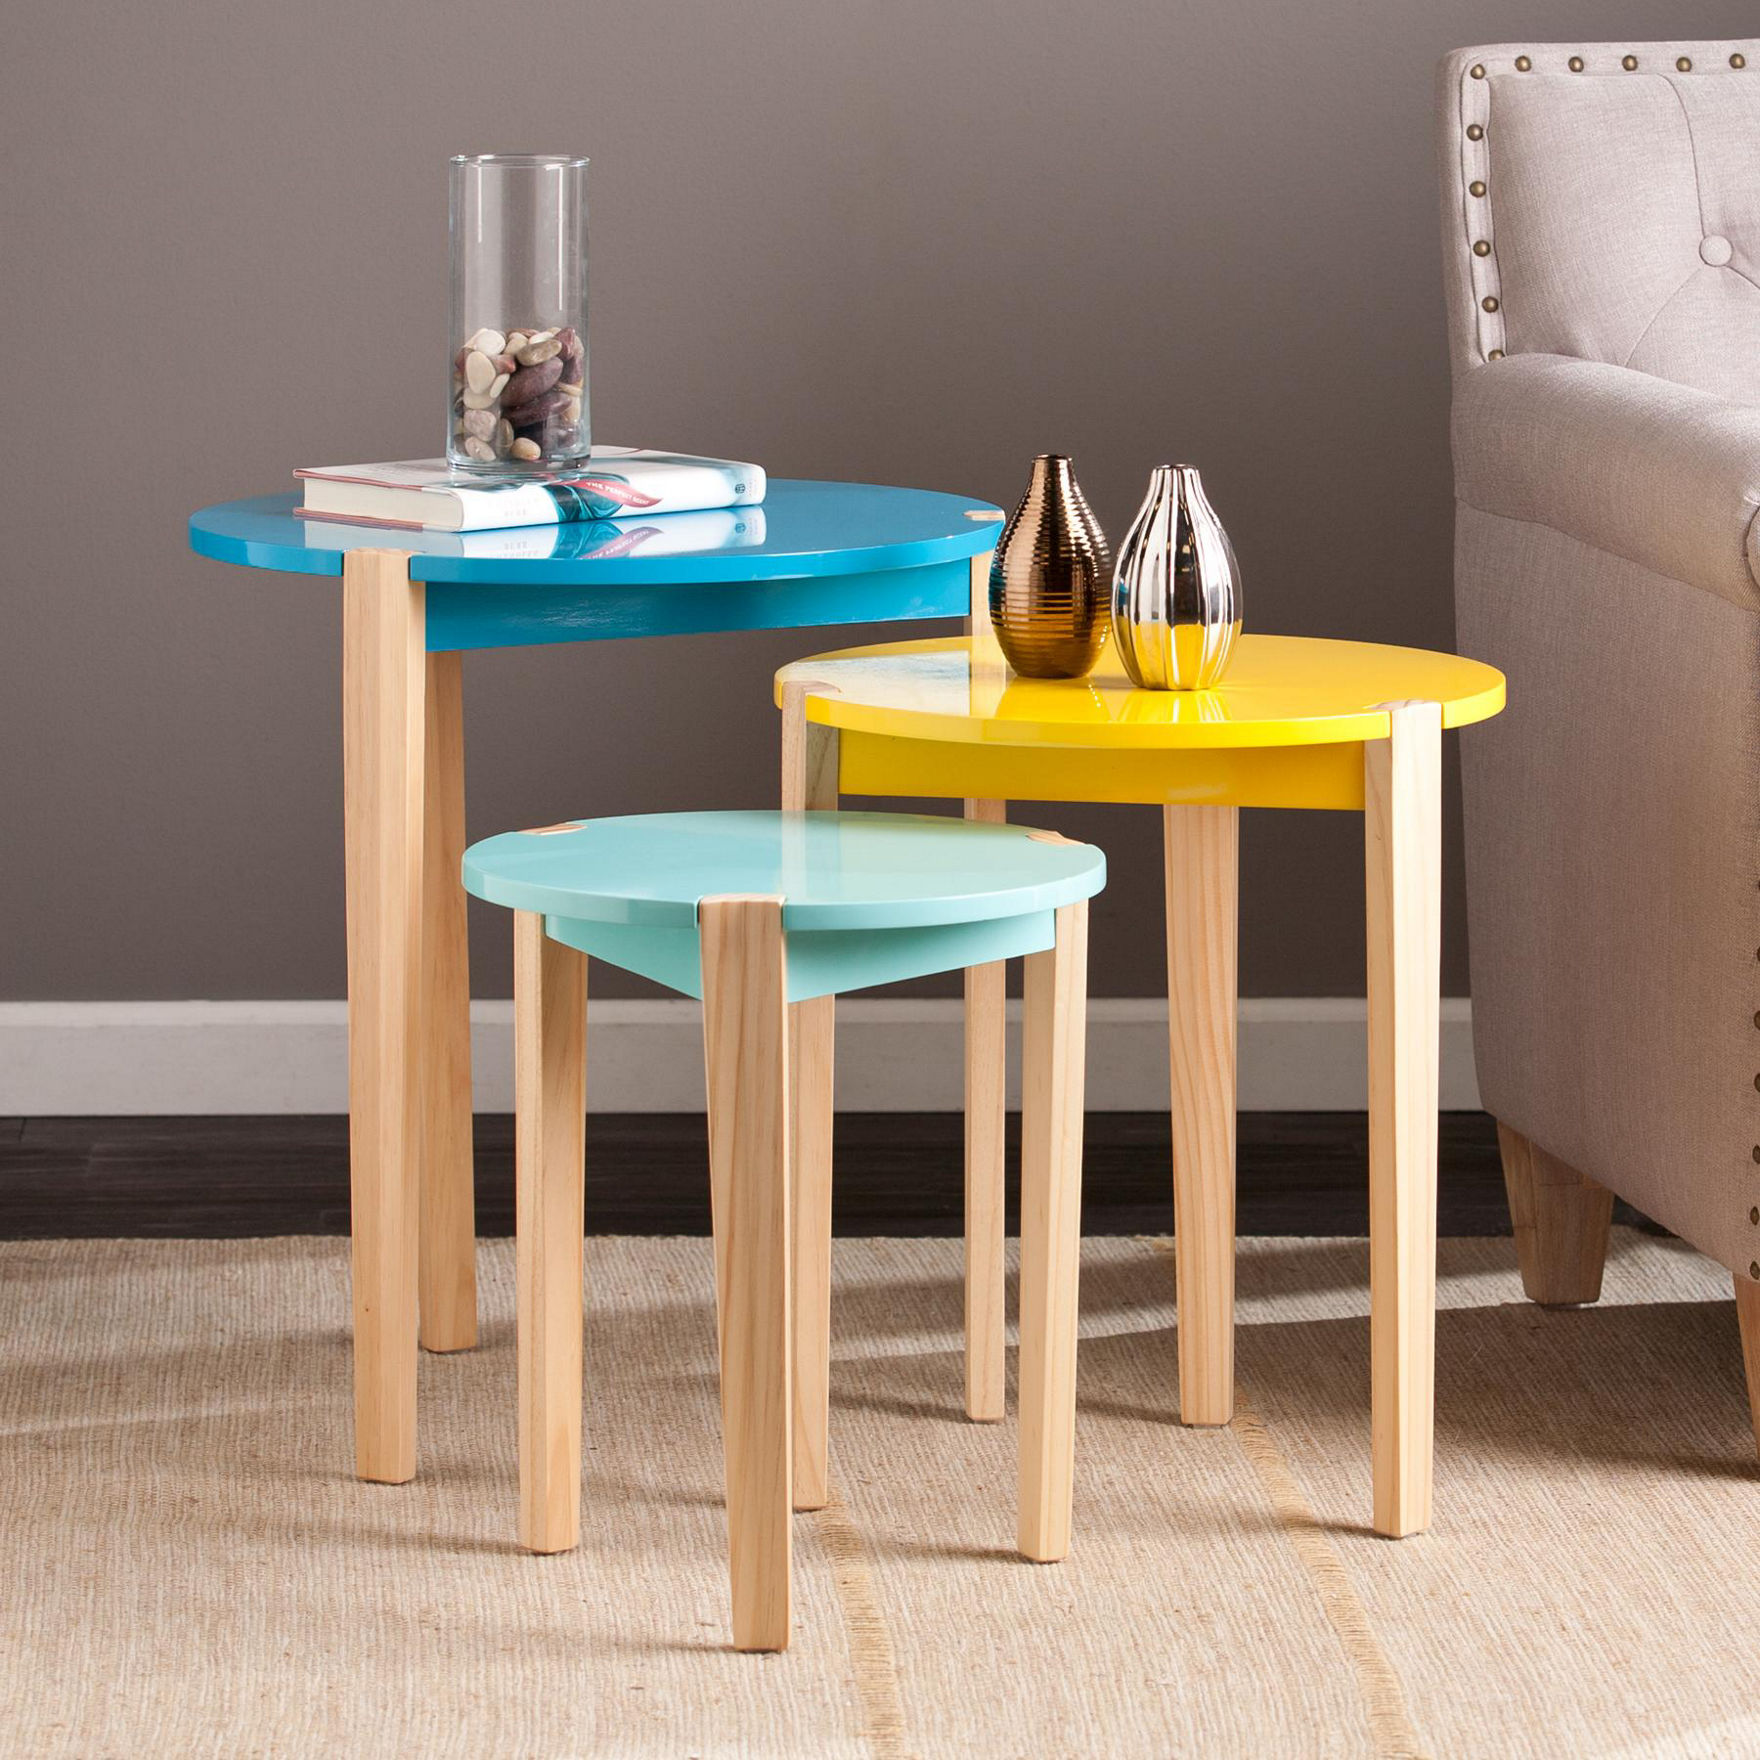 Southern Enterprises Blue Accent & End Tables Living Room Furniture